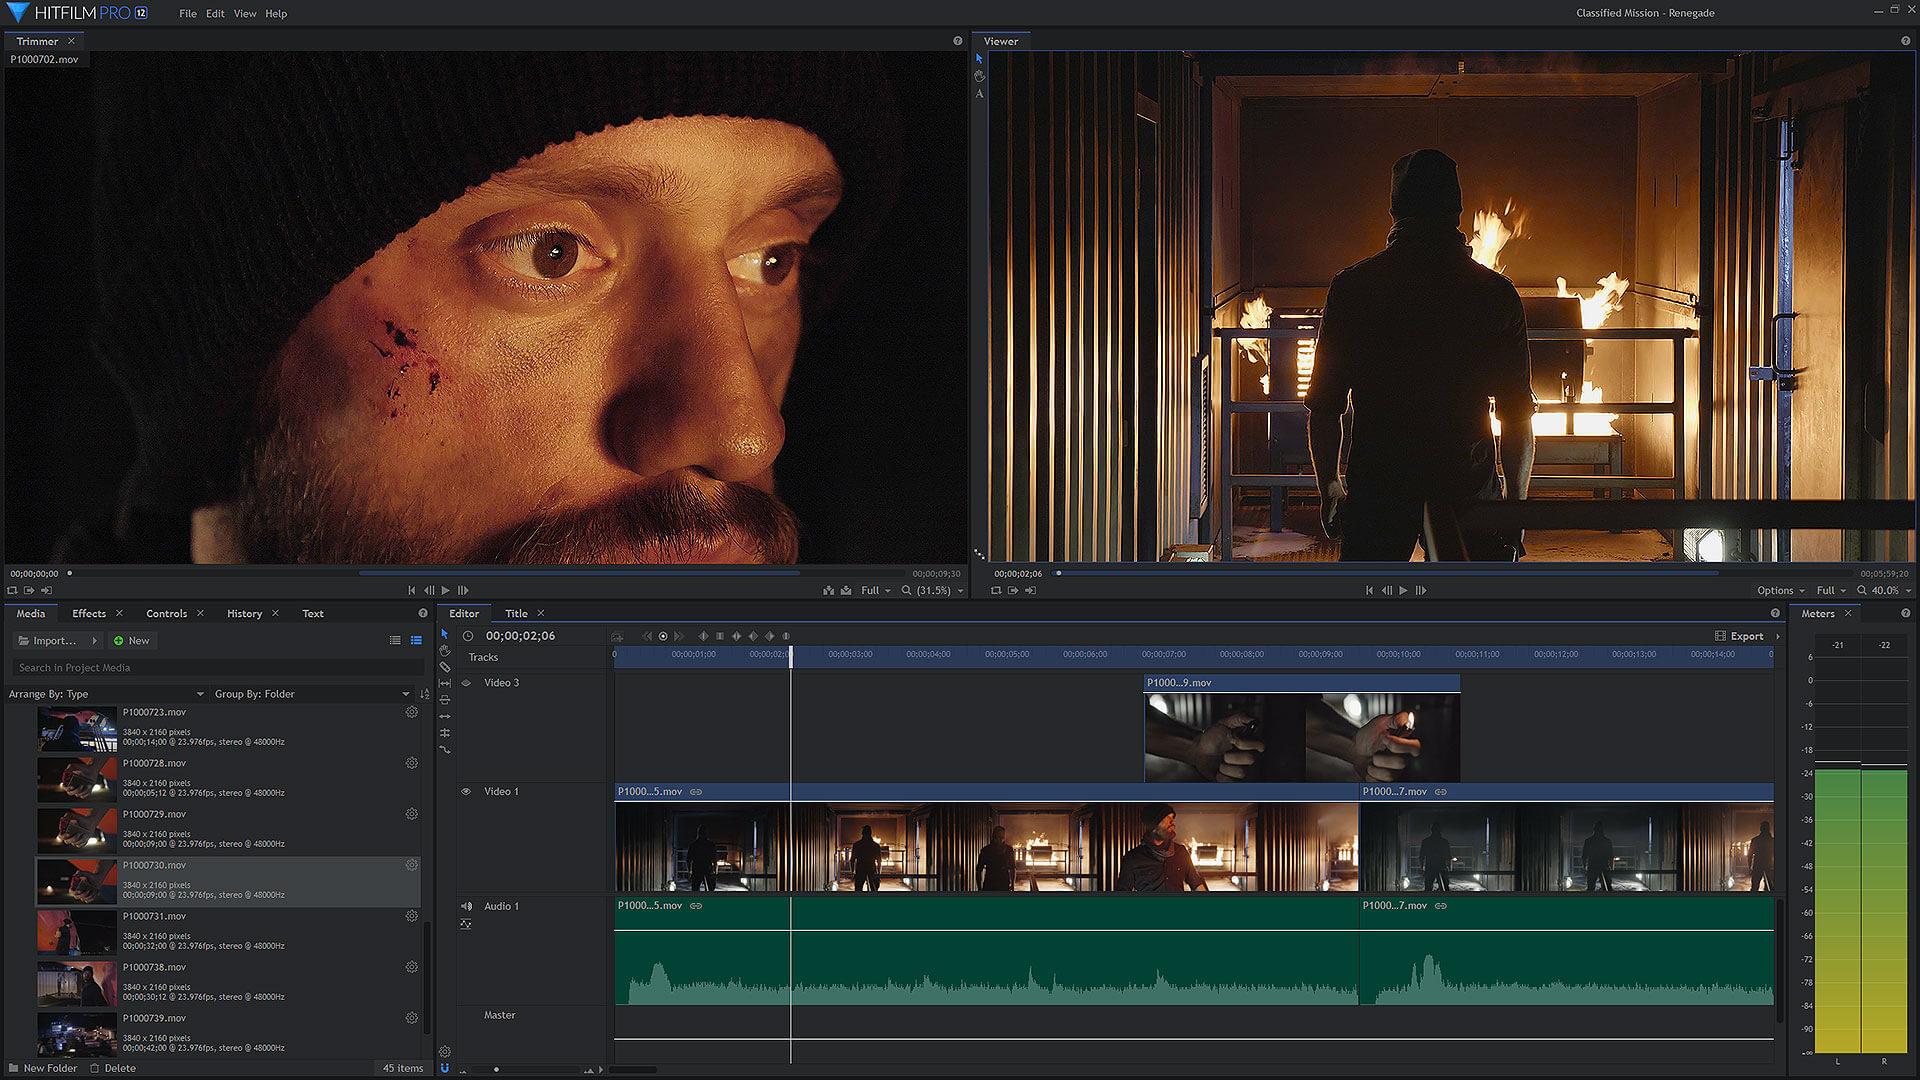 hitfilm-pro-product-key